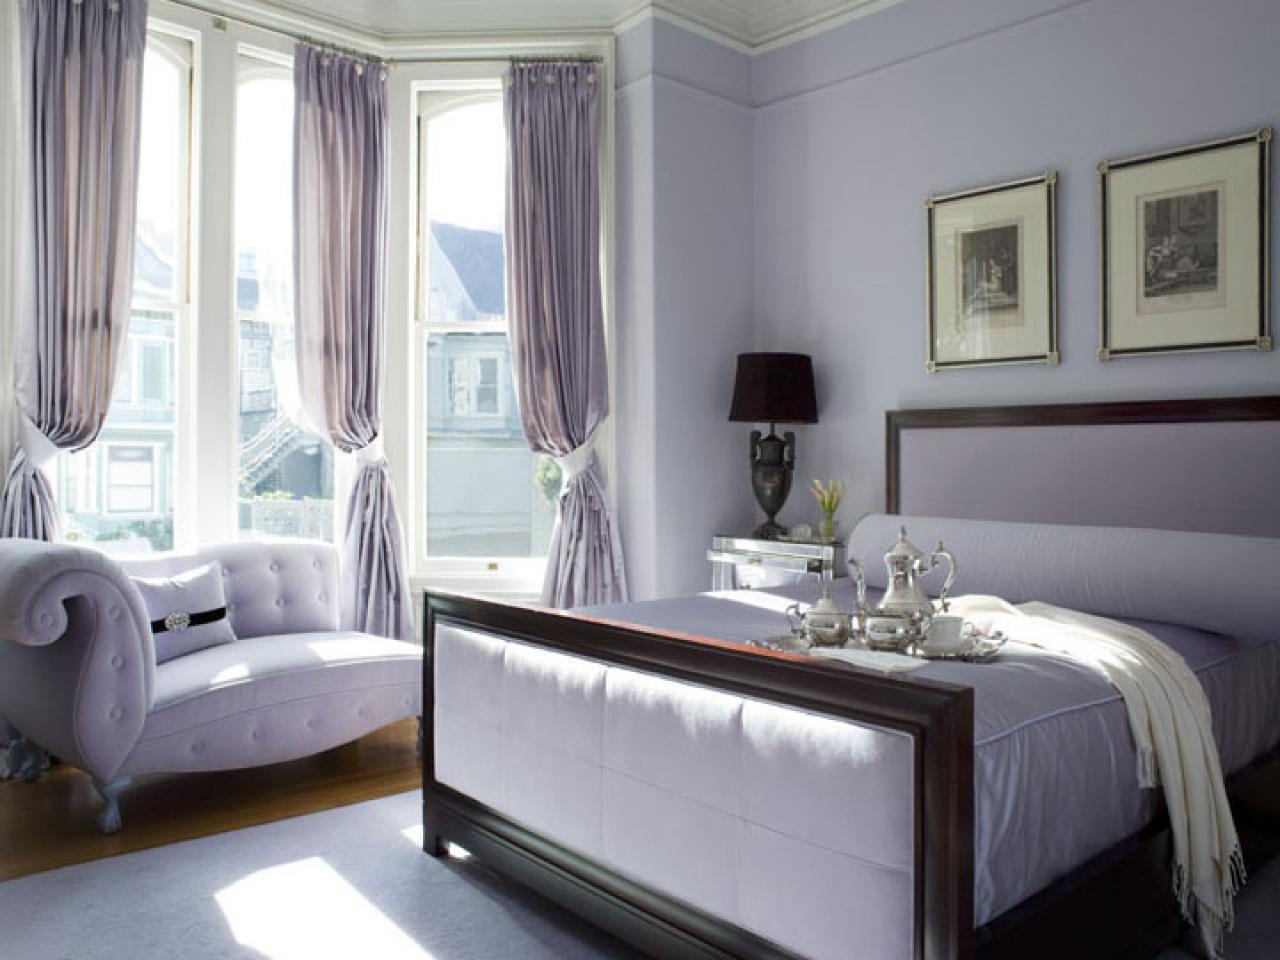 Satu Contoh Gabungan Warna Pastel Yang Ideal Di Dalam Bilik Tidur